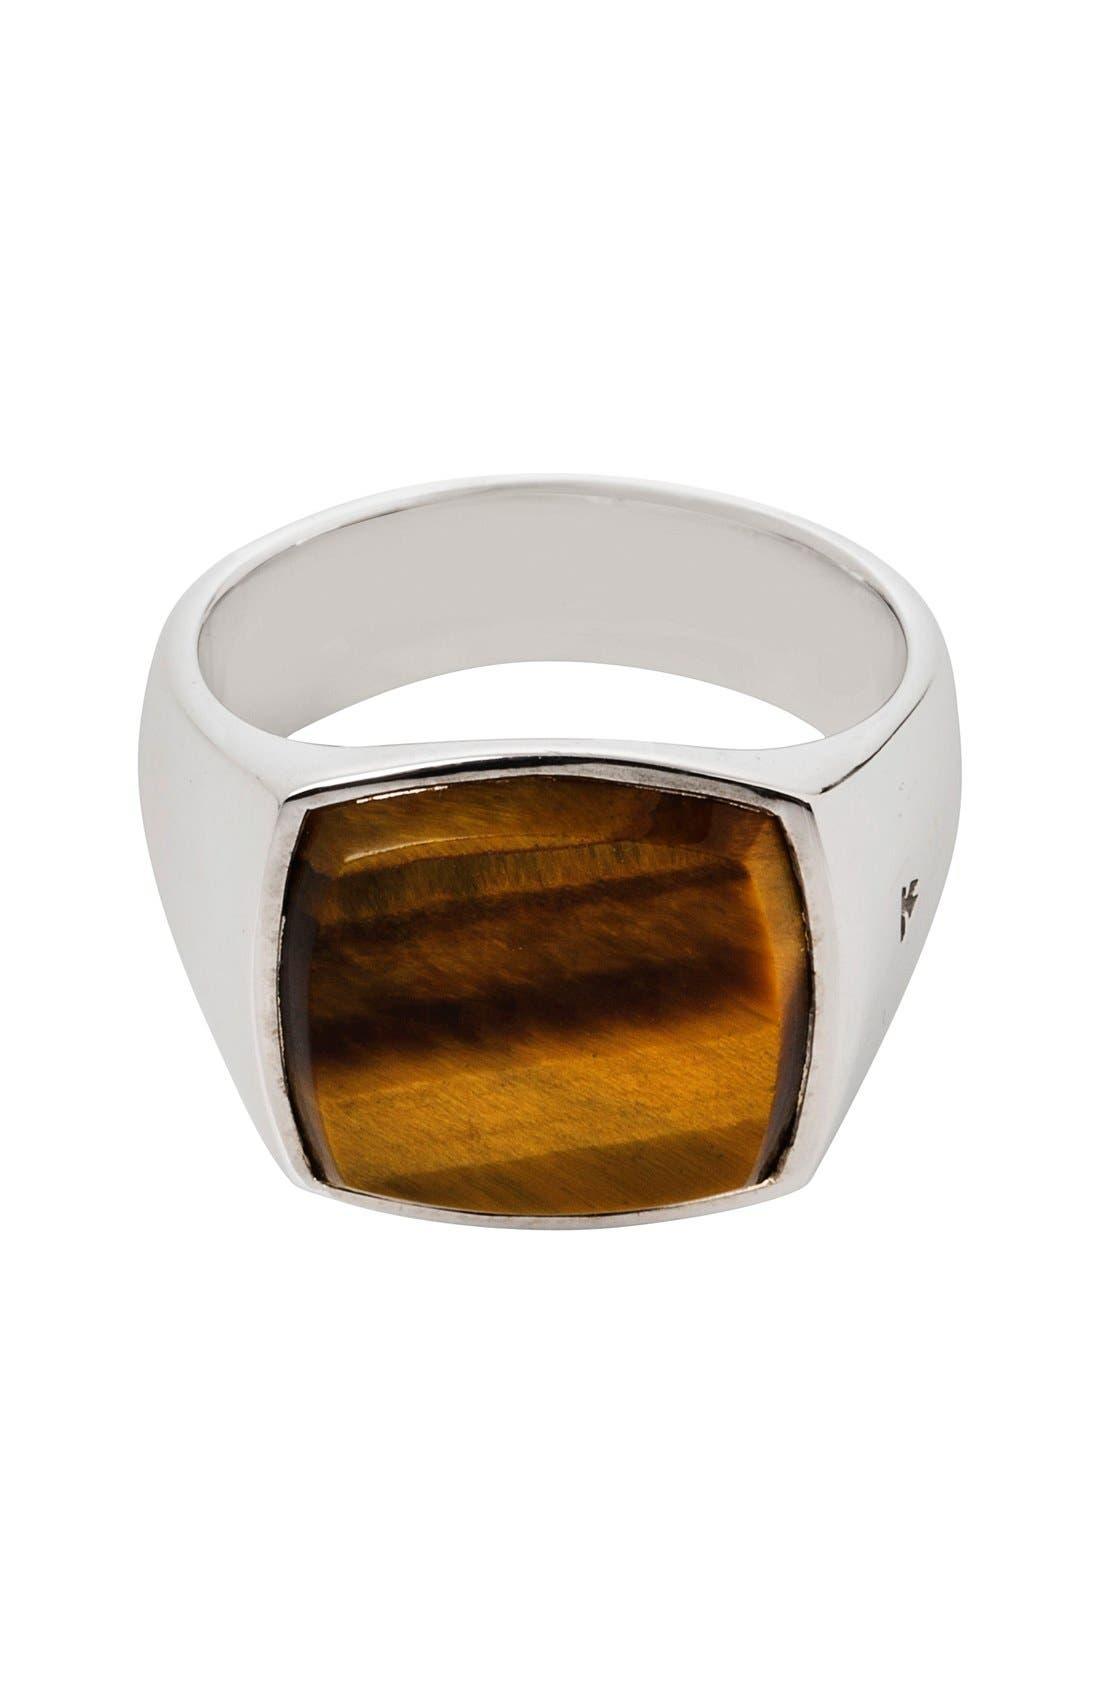 Cushion Tiger's Eye Signet Ring,                         Main,                         color, Silver